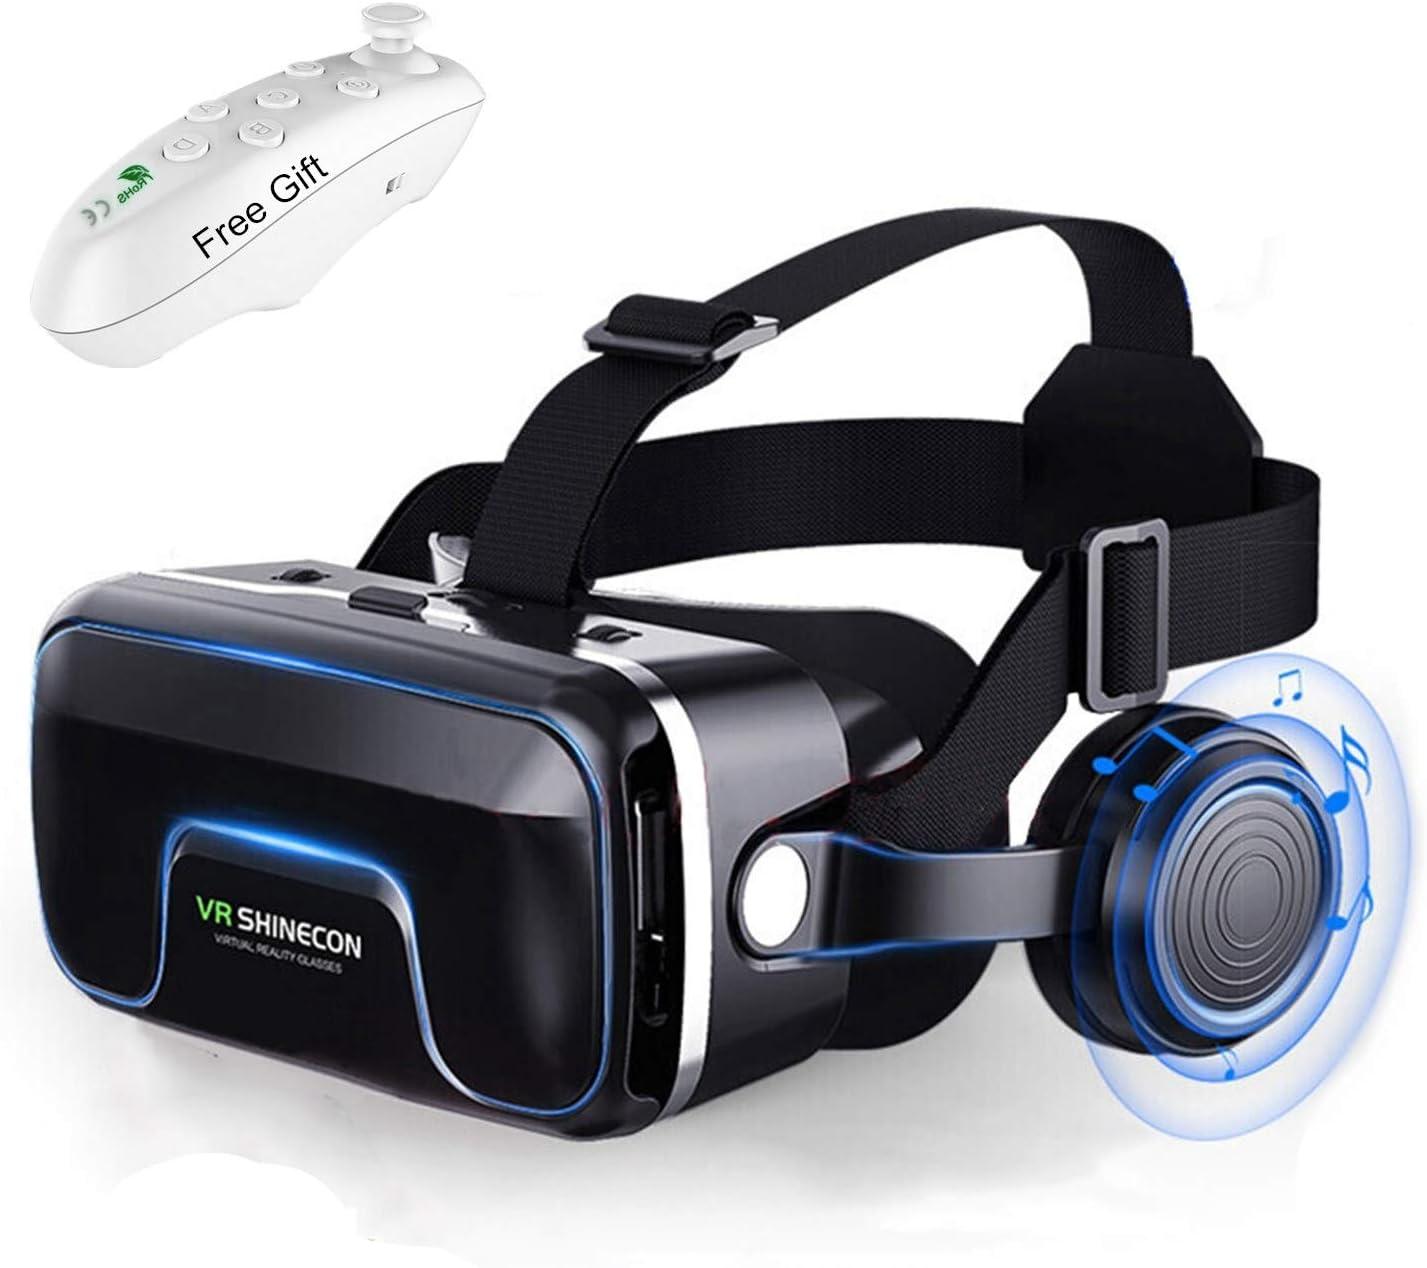 Immersive 3D 日本未発売 VR Glasses Box Virtual Reality Pro Headset Version 休み